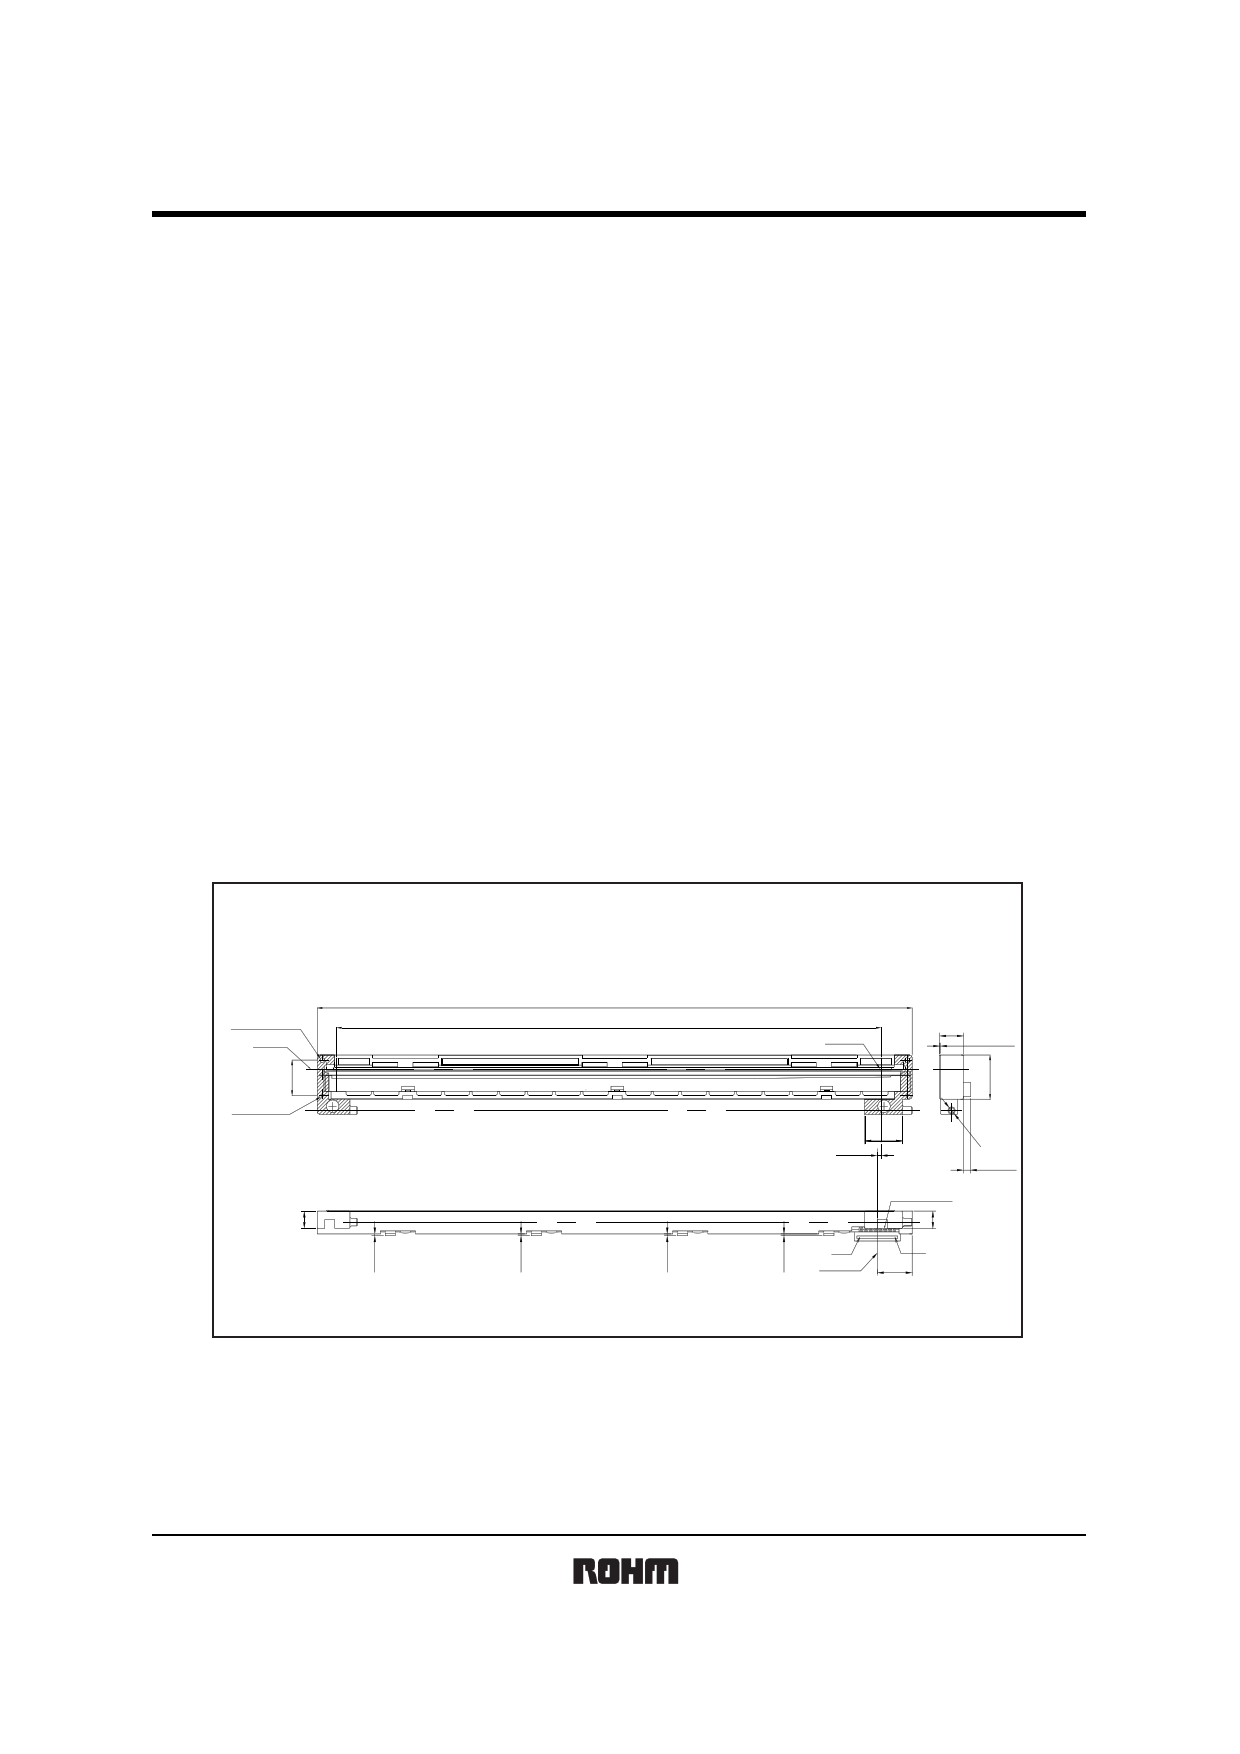 IA1208-FE10A دیتاشیت PDF